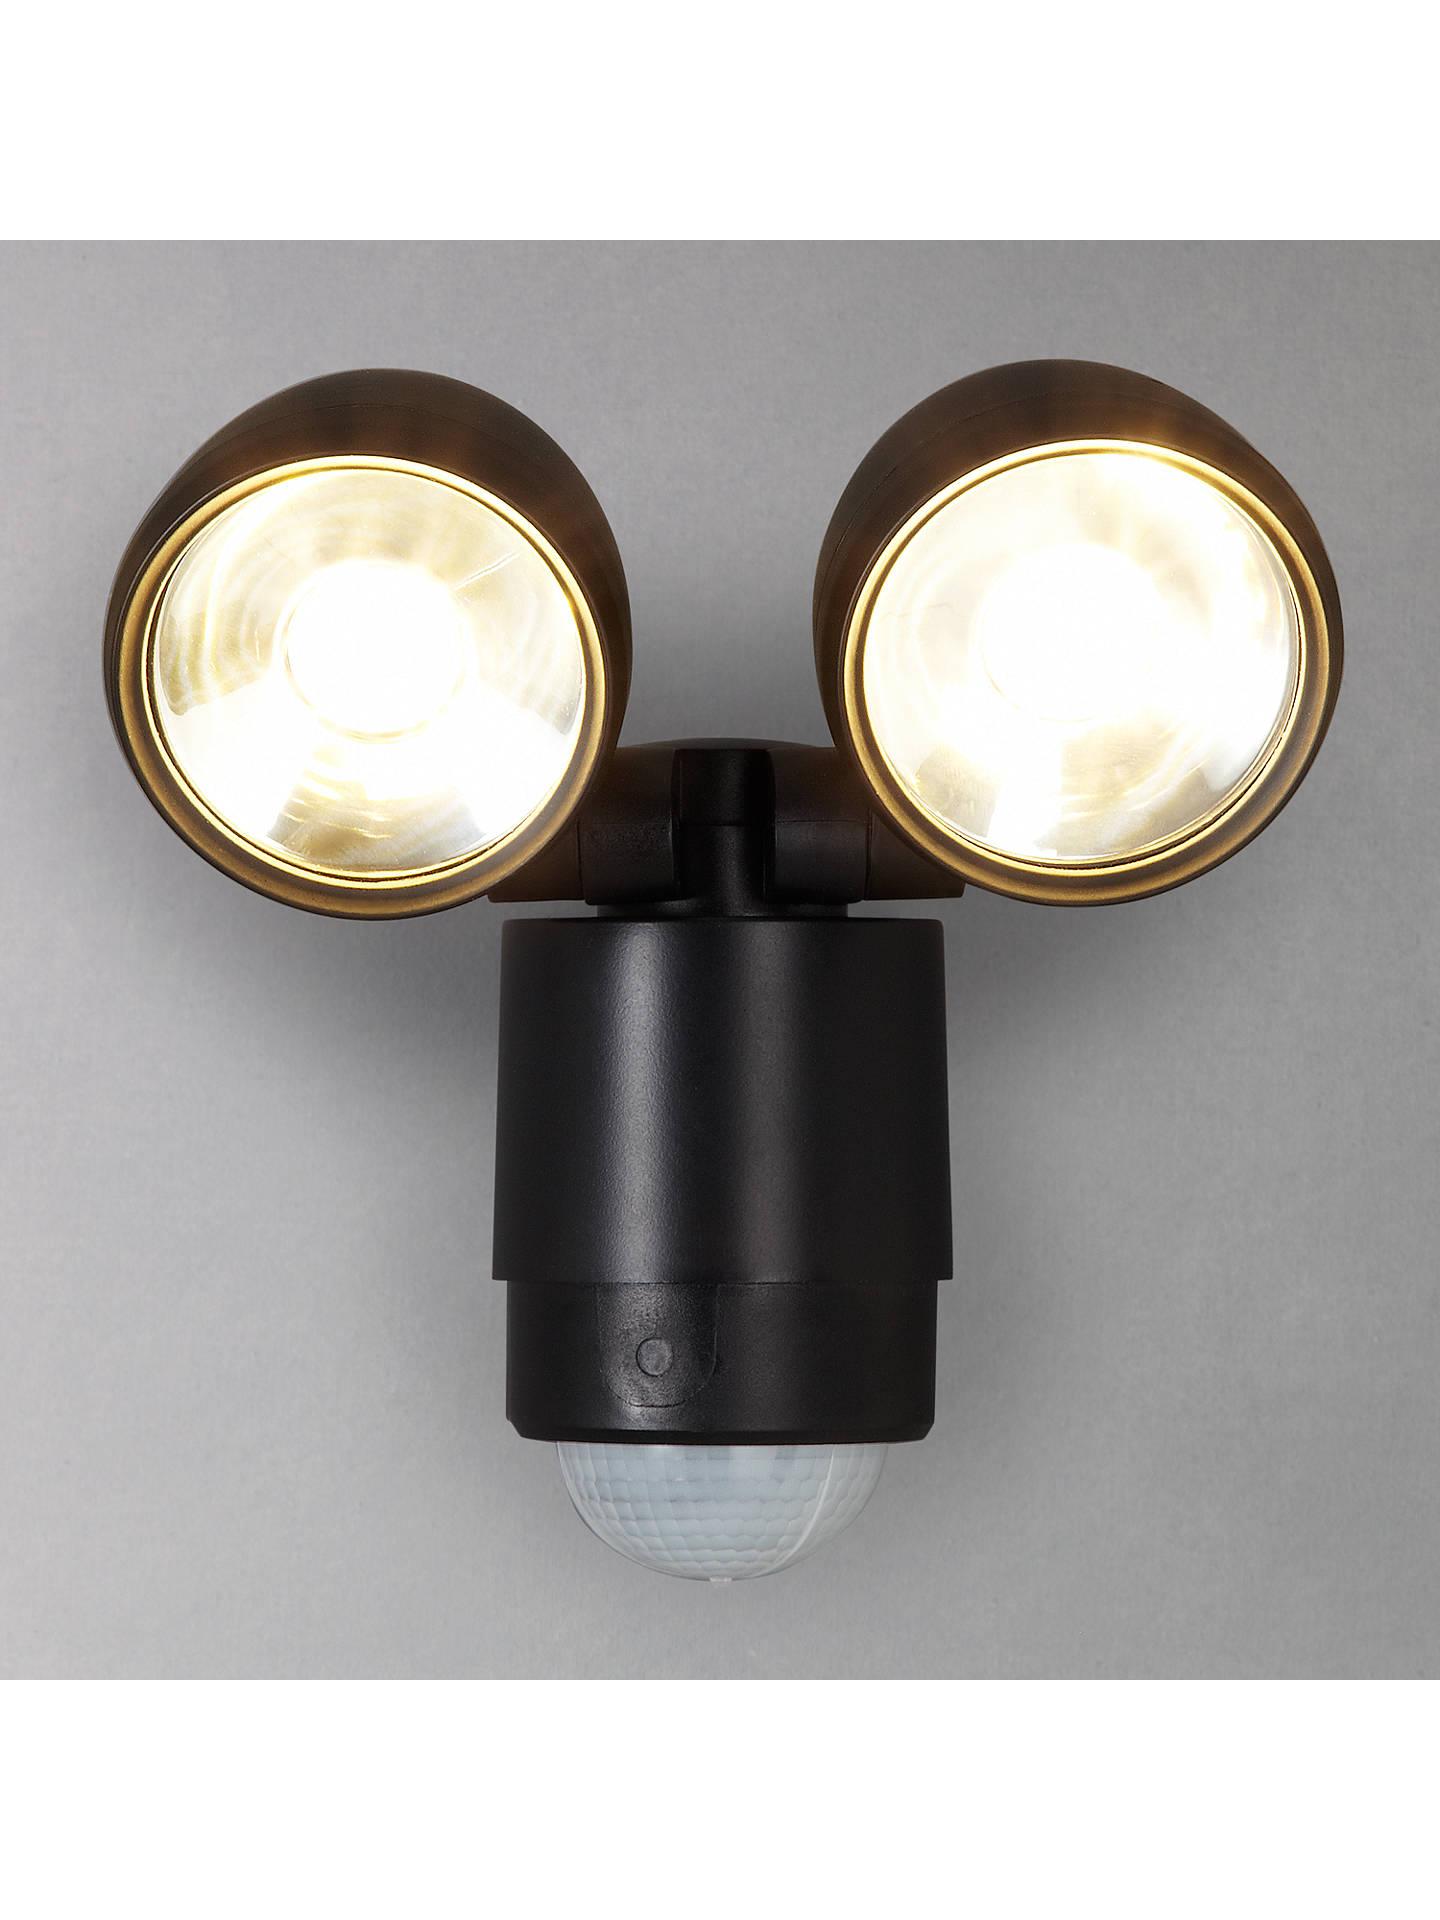 Luxform Umbriel Twin Pir Sensor Security Led Outdoor Light